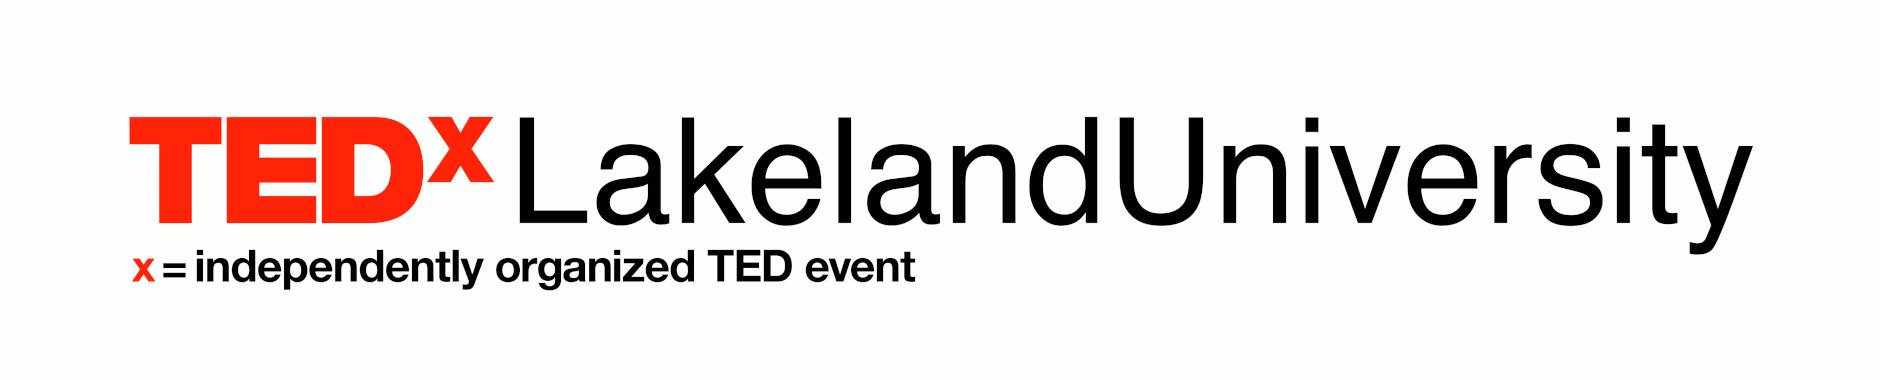 TEDxLakelandUniversity